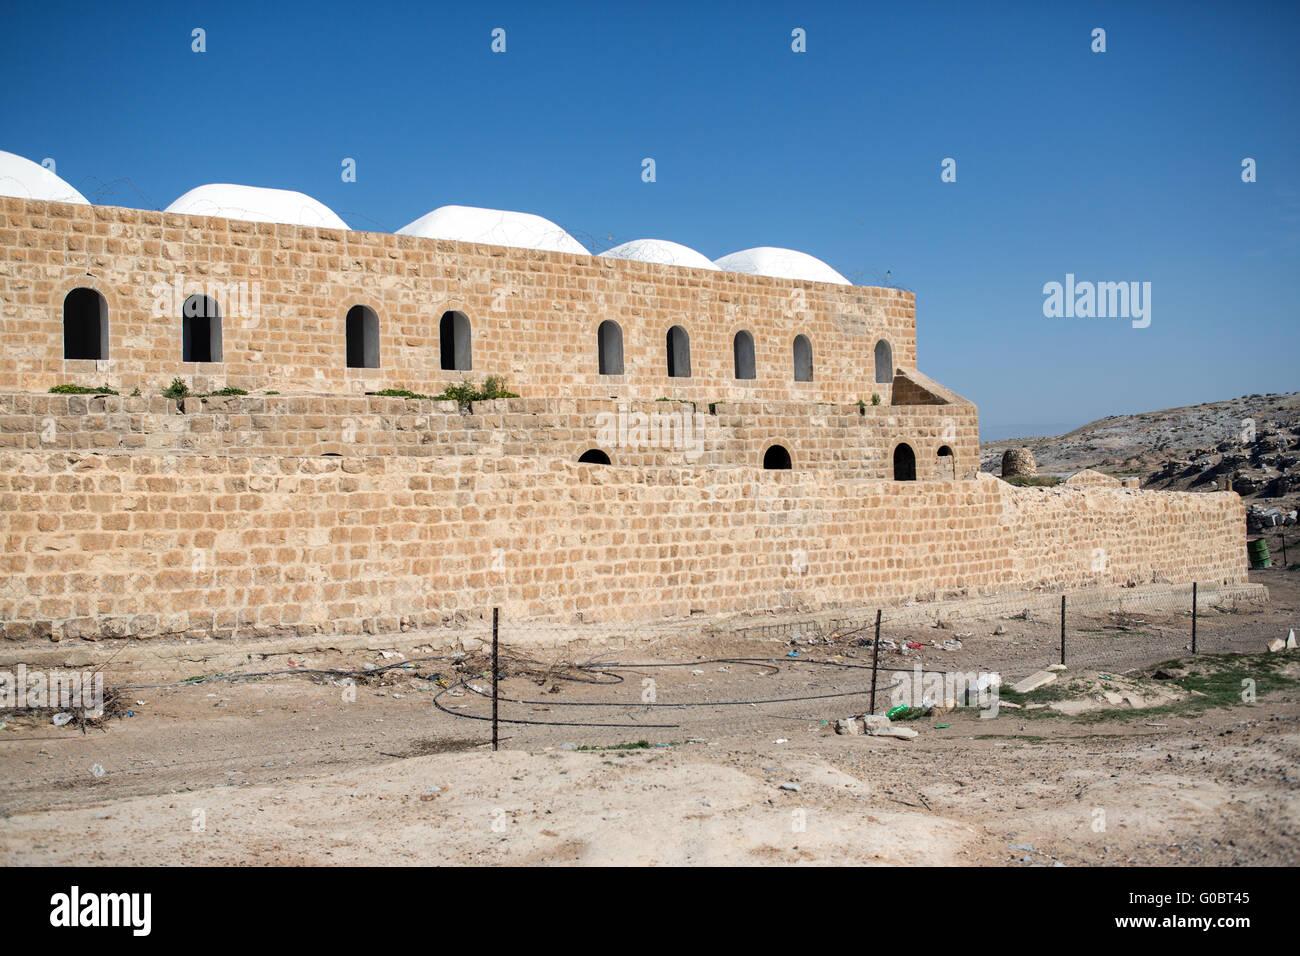 Nabi Musa site in the Judean desert , Israel - Stock Image